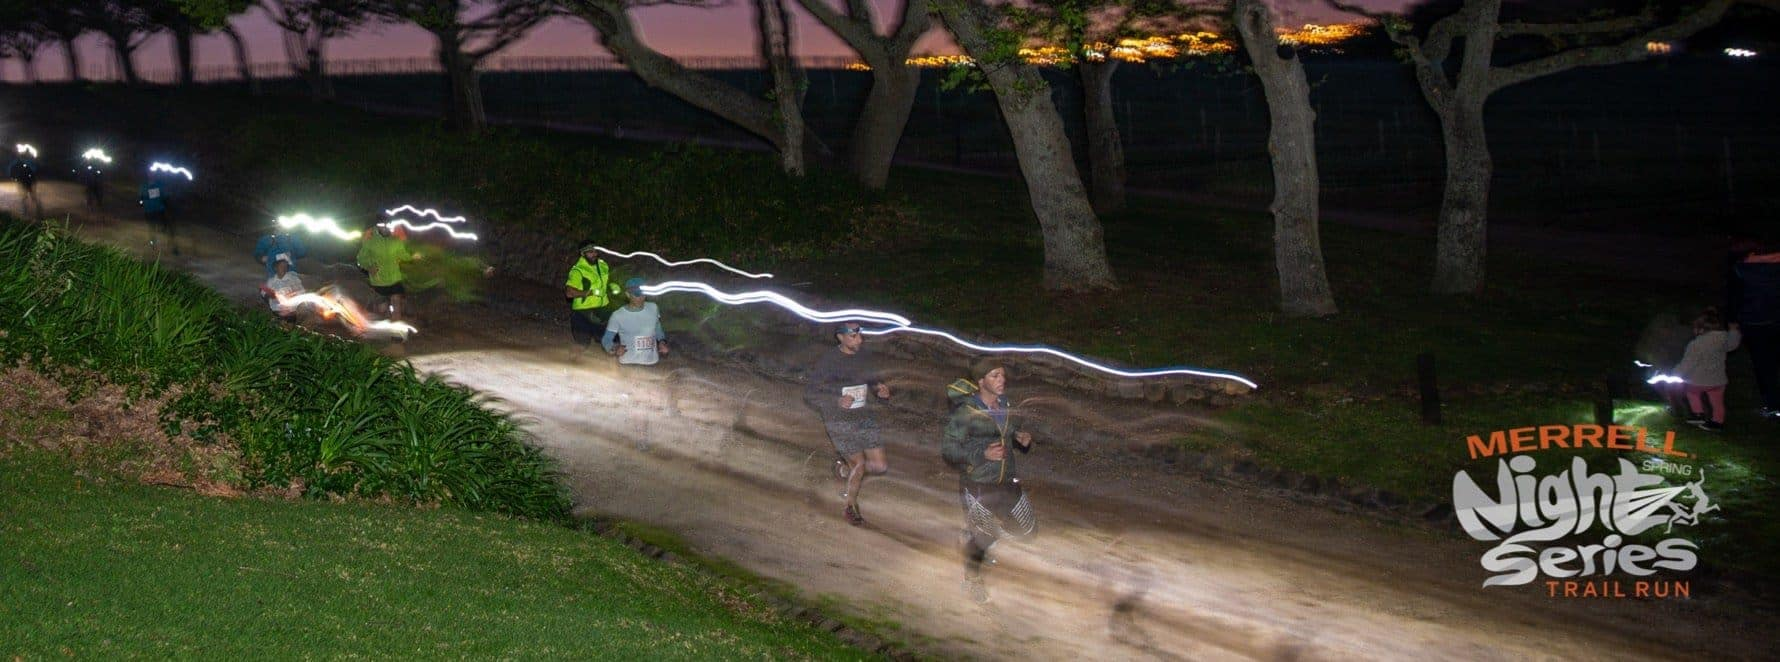 Summer Night Run